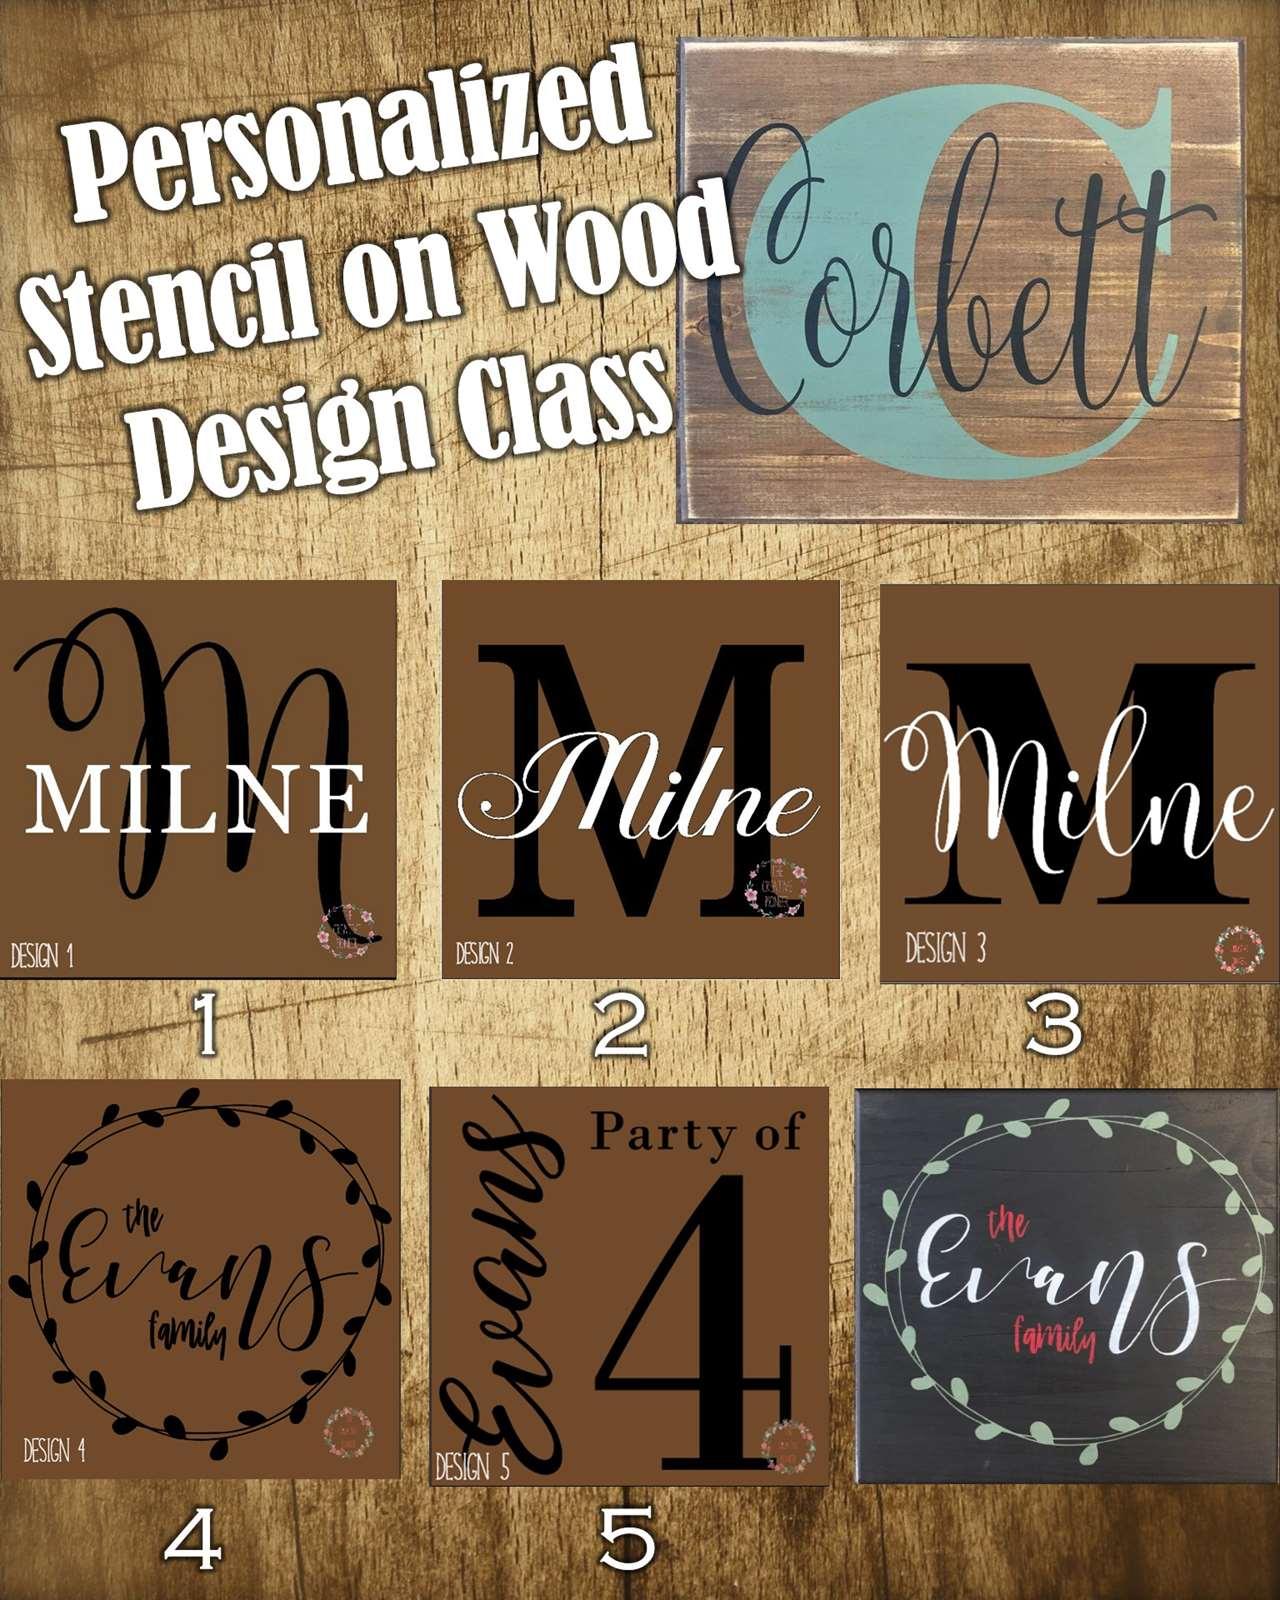 Custom Stencil on Wood Design Class - Mon, Nov 13 7PM at Exton